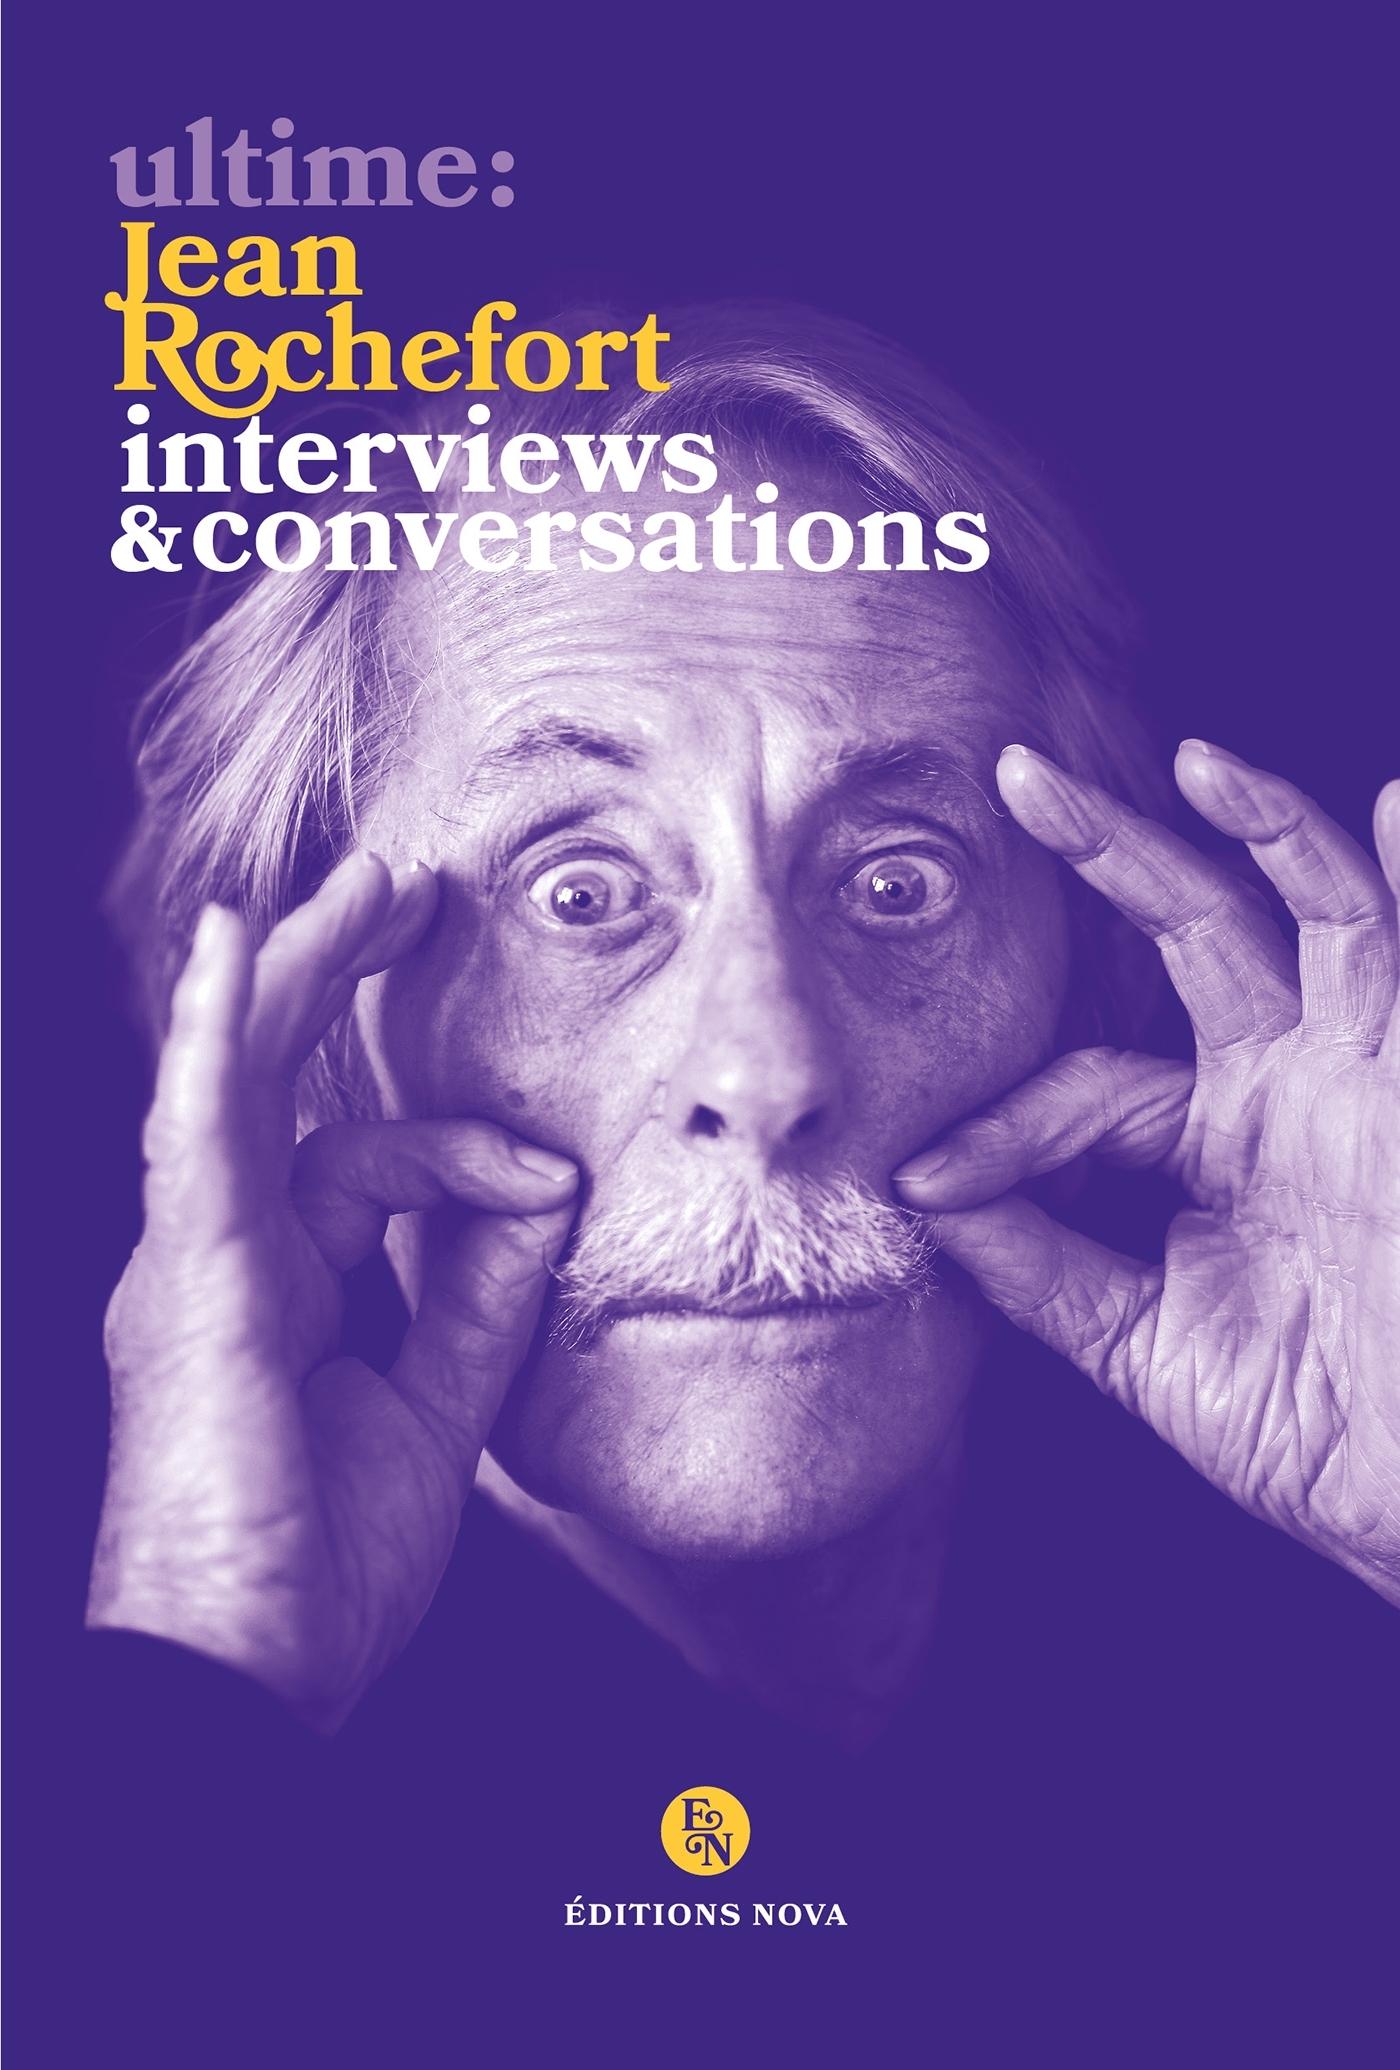 ULTIME: JEAN ROCHEFORT. INTERVIEWS & CONVERSATIONS